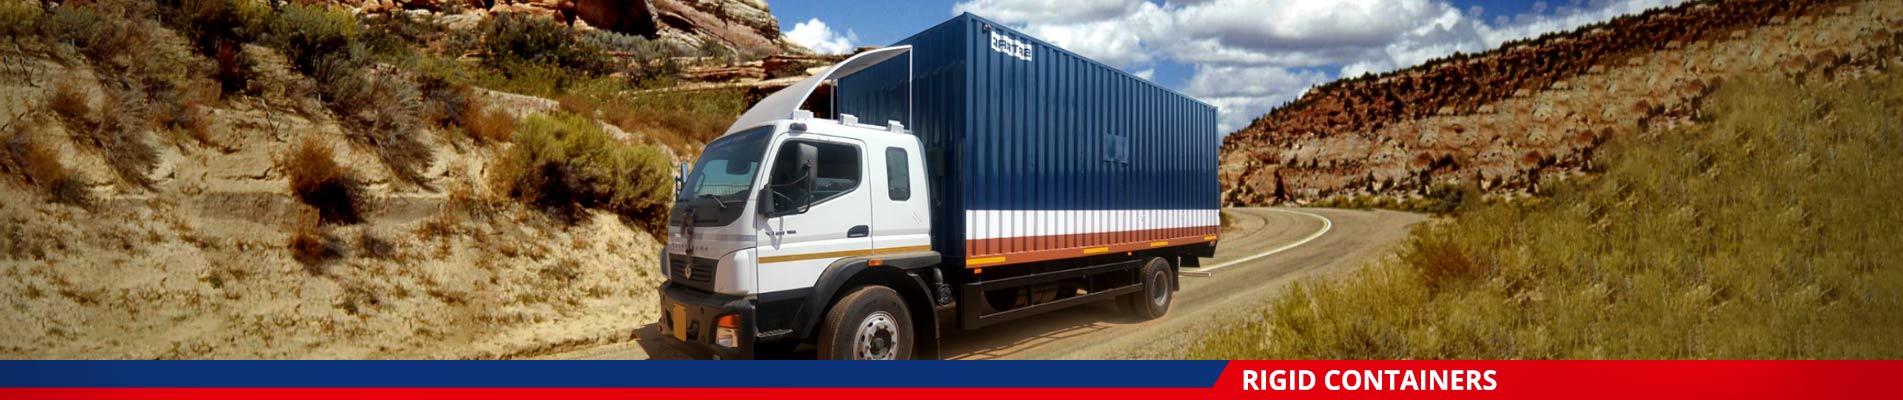 Rigid Containers Manufacturers in India